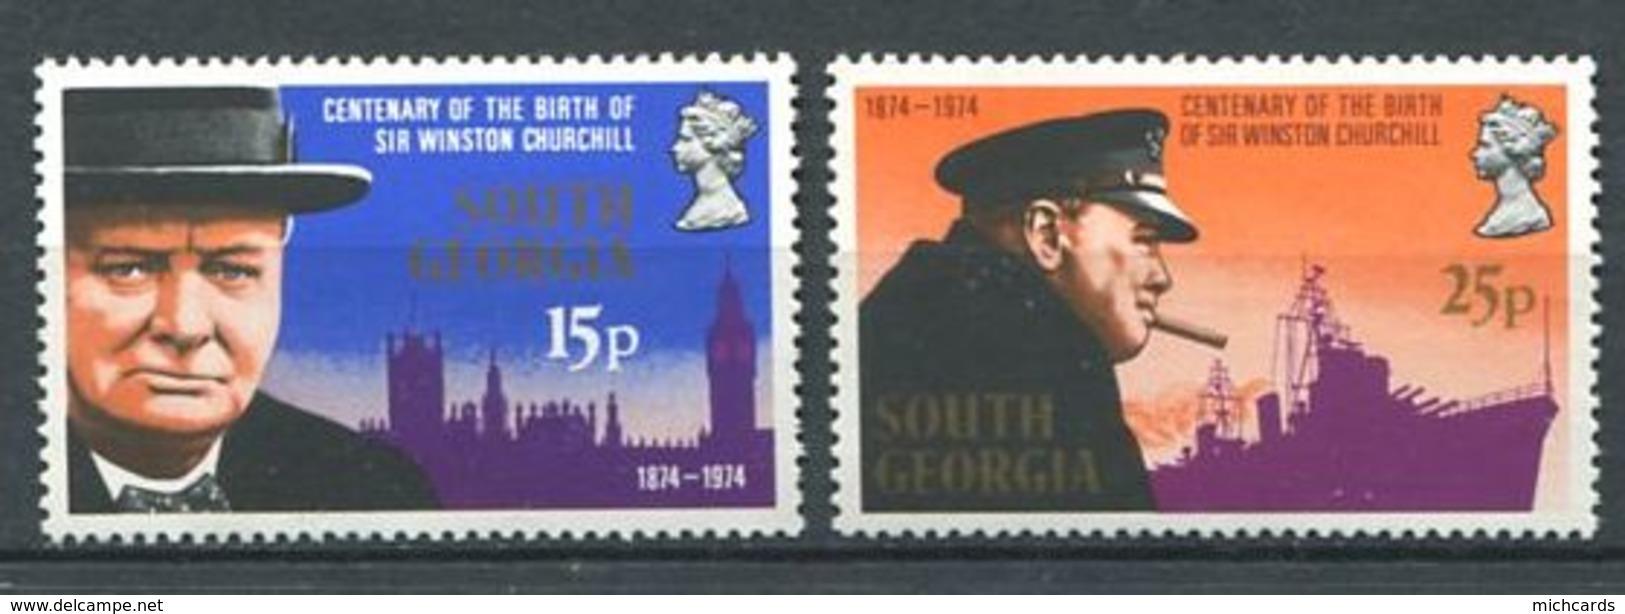 243 SUD GEORGIE 1974 - Yvert 47/48 - Churchill - Neuf **(MNH) Sans Charniere - Géorgie Du Sud